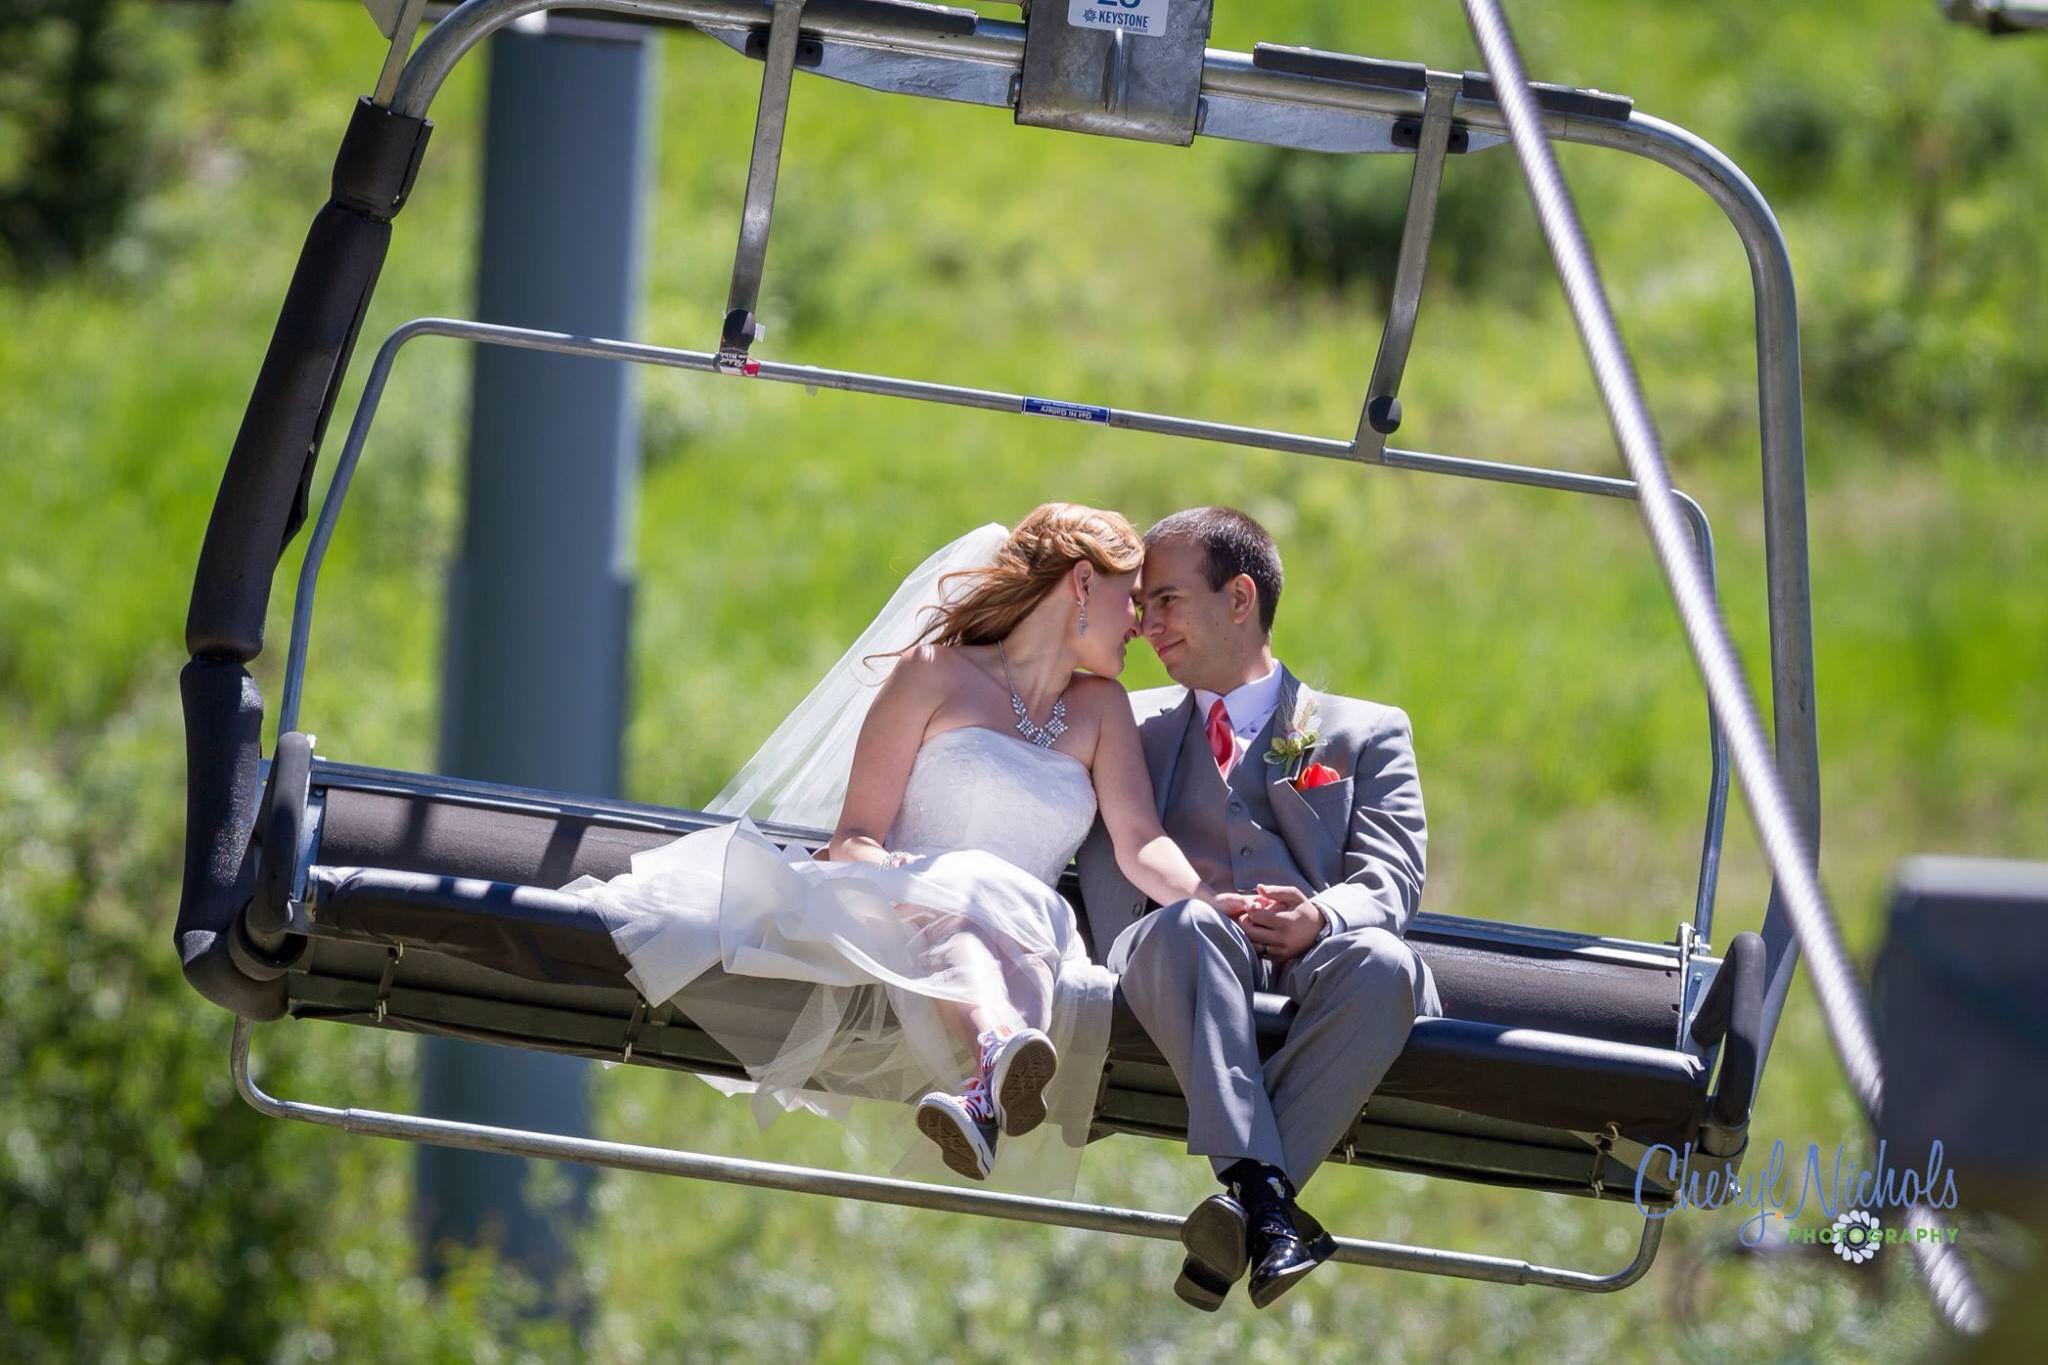 Wedding photo   mountain   ski resort   Colorado   chairlift   bride   groom   Cheryl Nichols Photography. http://cherylnicholsphotography.com